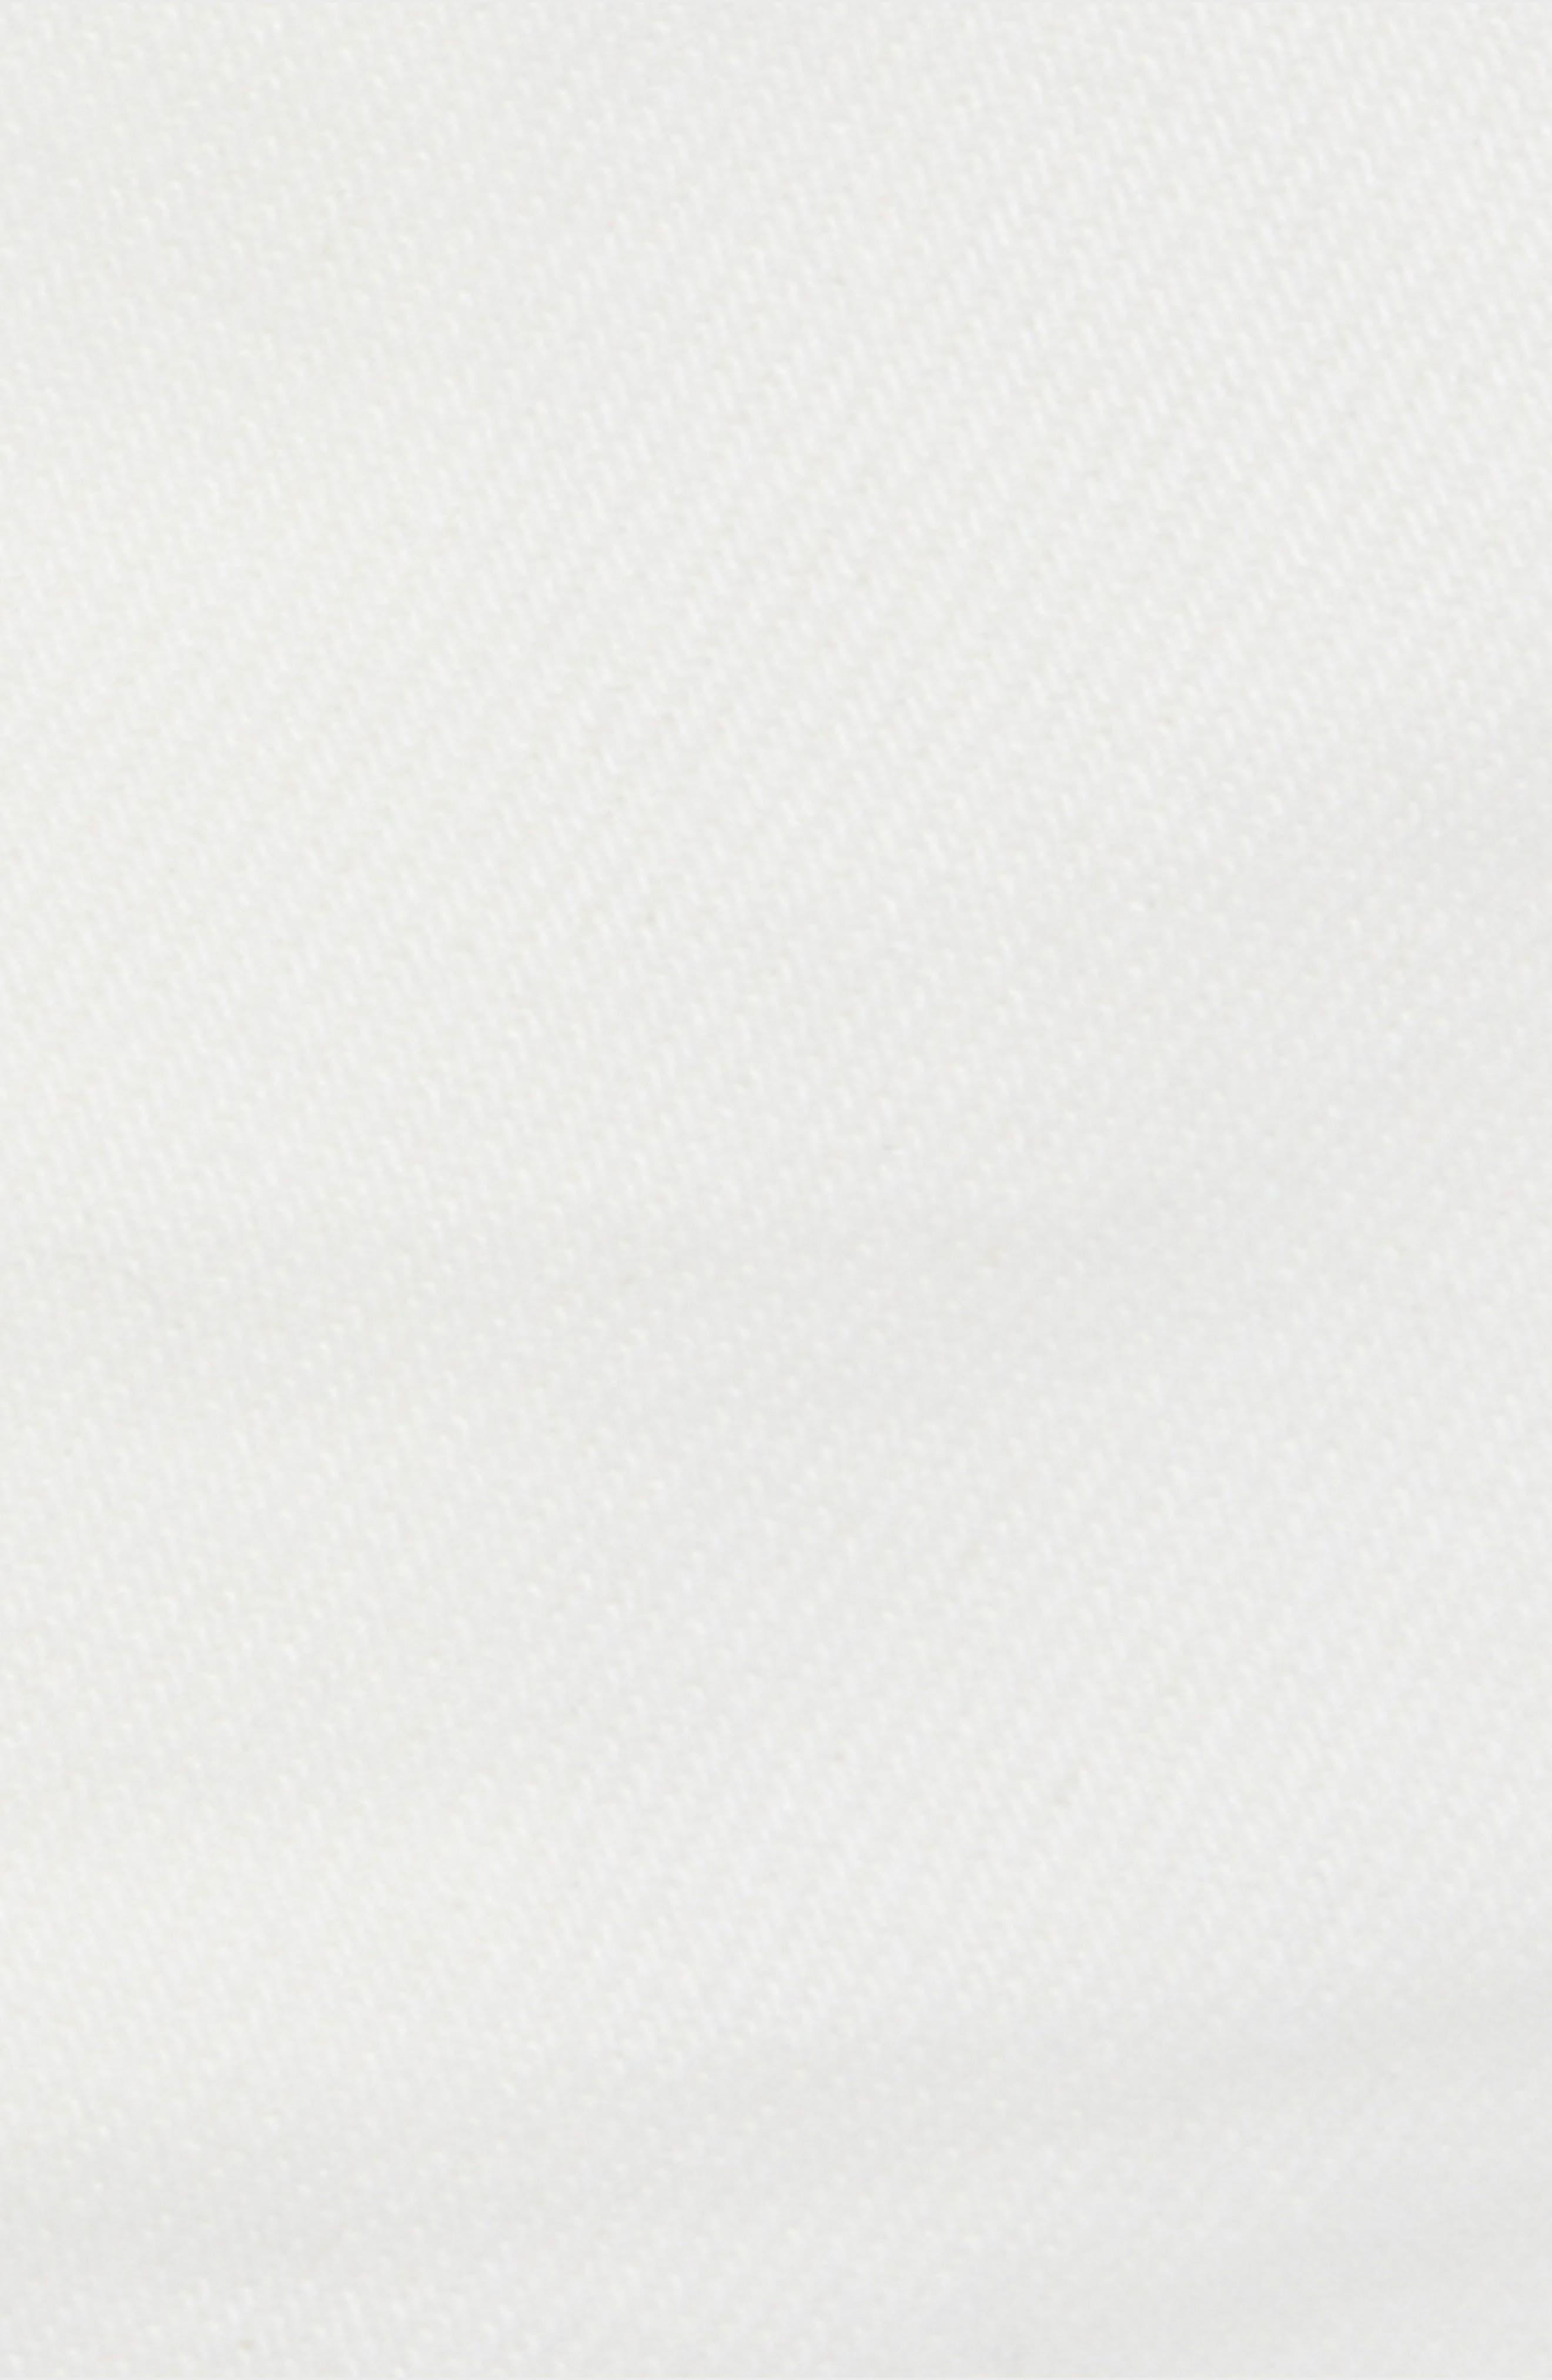 FREE PEOPLE,                             Zip It Up Denim Miniskirt,                             Alternate thumbnail 5, color,                             WHITE